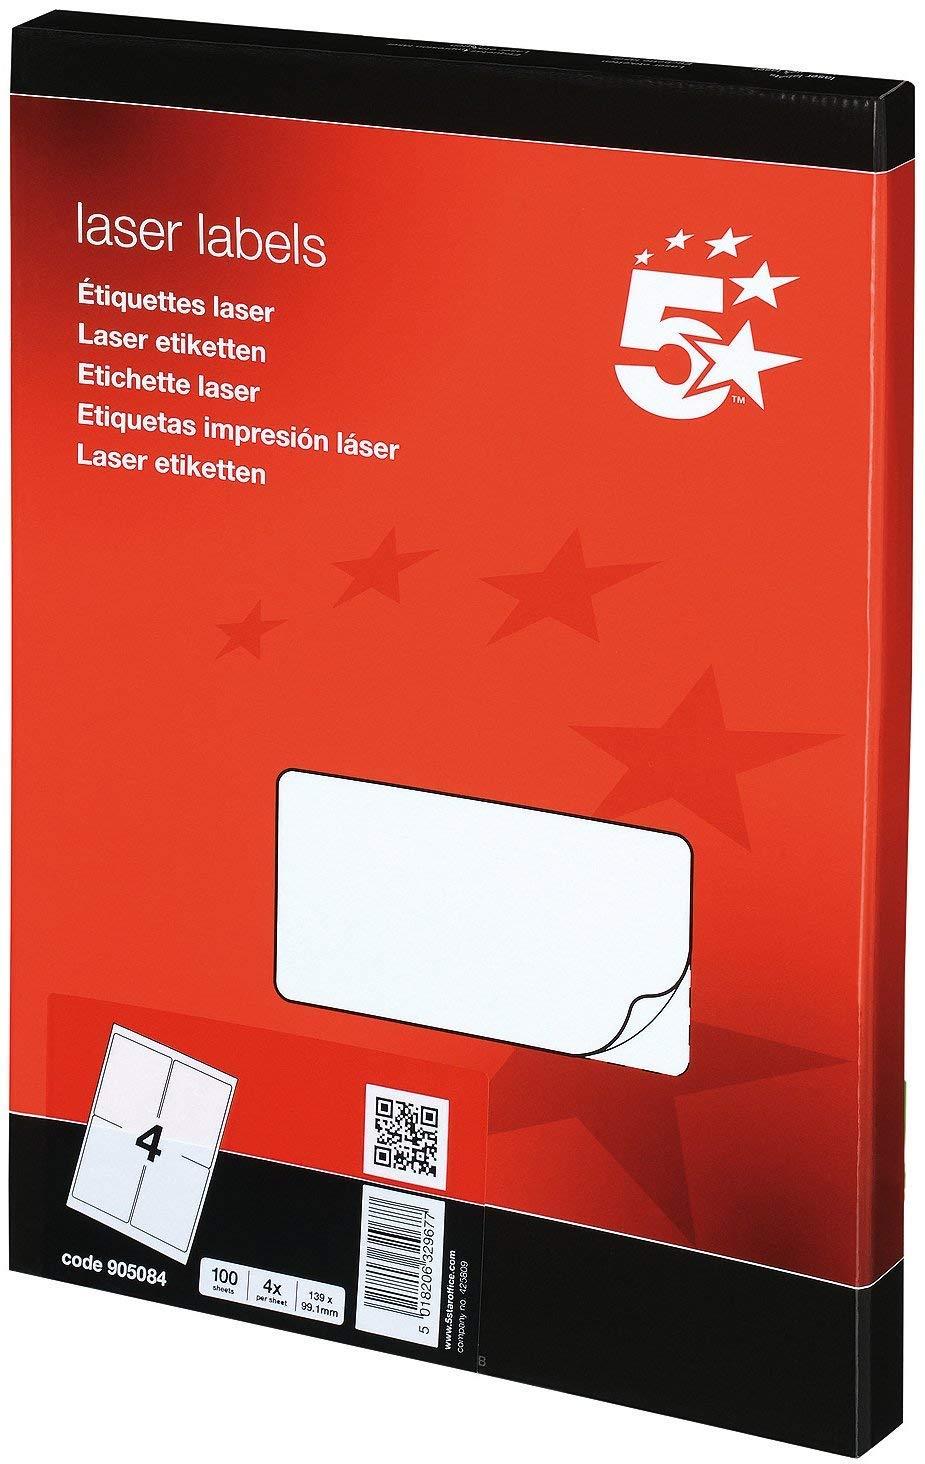 5 Star Addressing Labels Laser 4 per Sheet 139x99.1mm White [400 Labels] Herma GmbH 905084